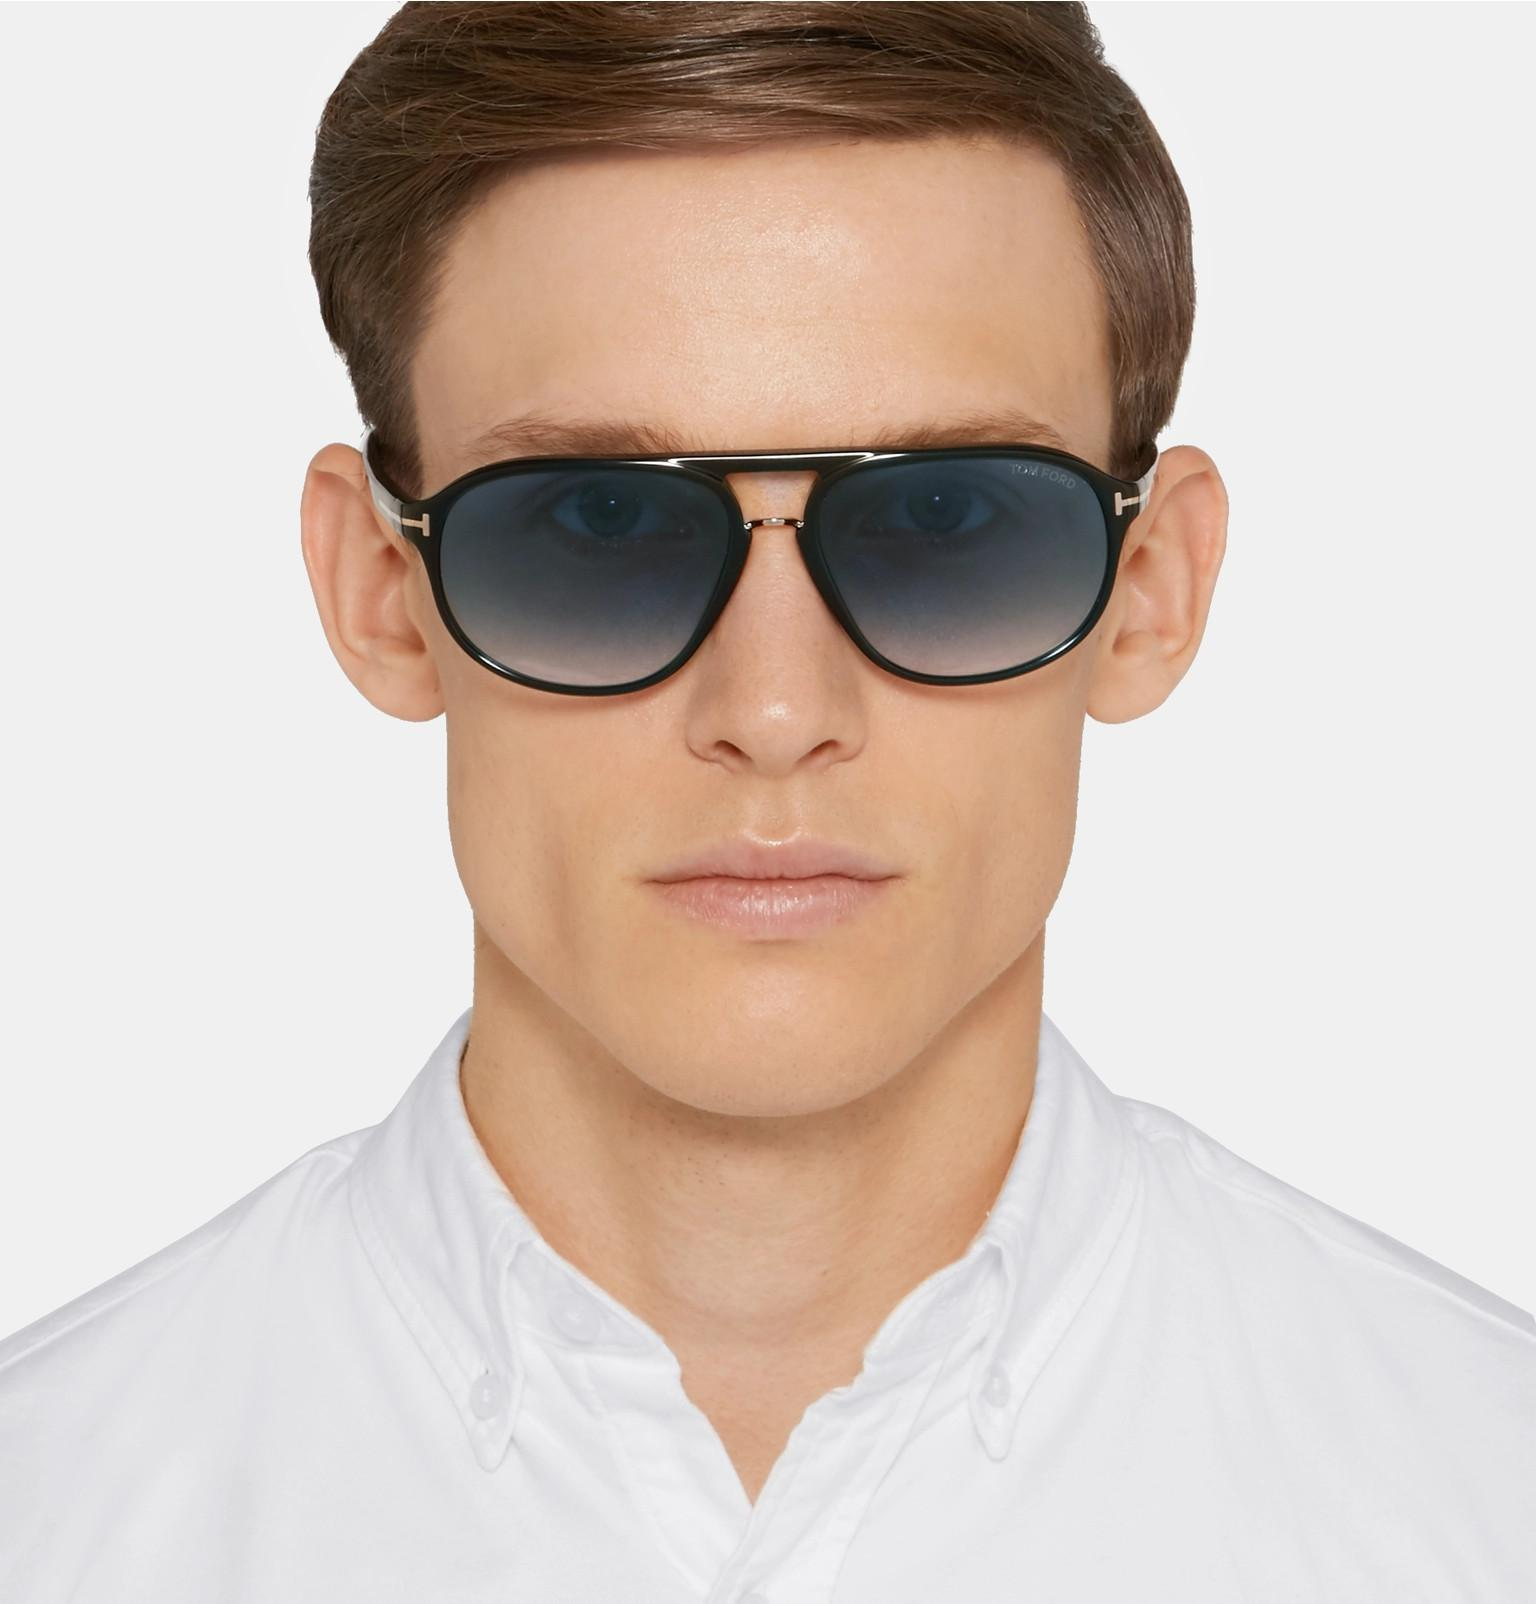 3bb5480d32c8 Tom Ford - Black Jacob Aviator-style Acetate Sunglasses for Men - Lyst.  View fullscreen